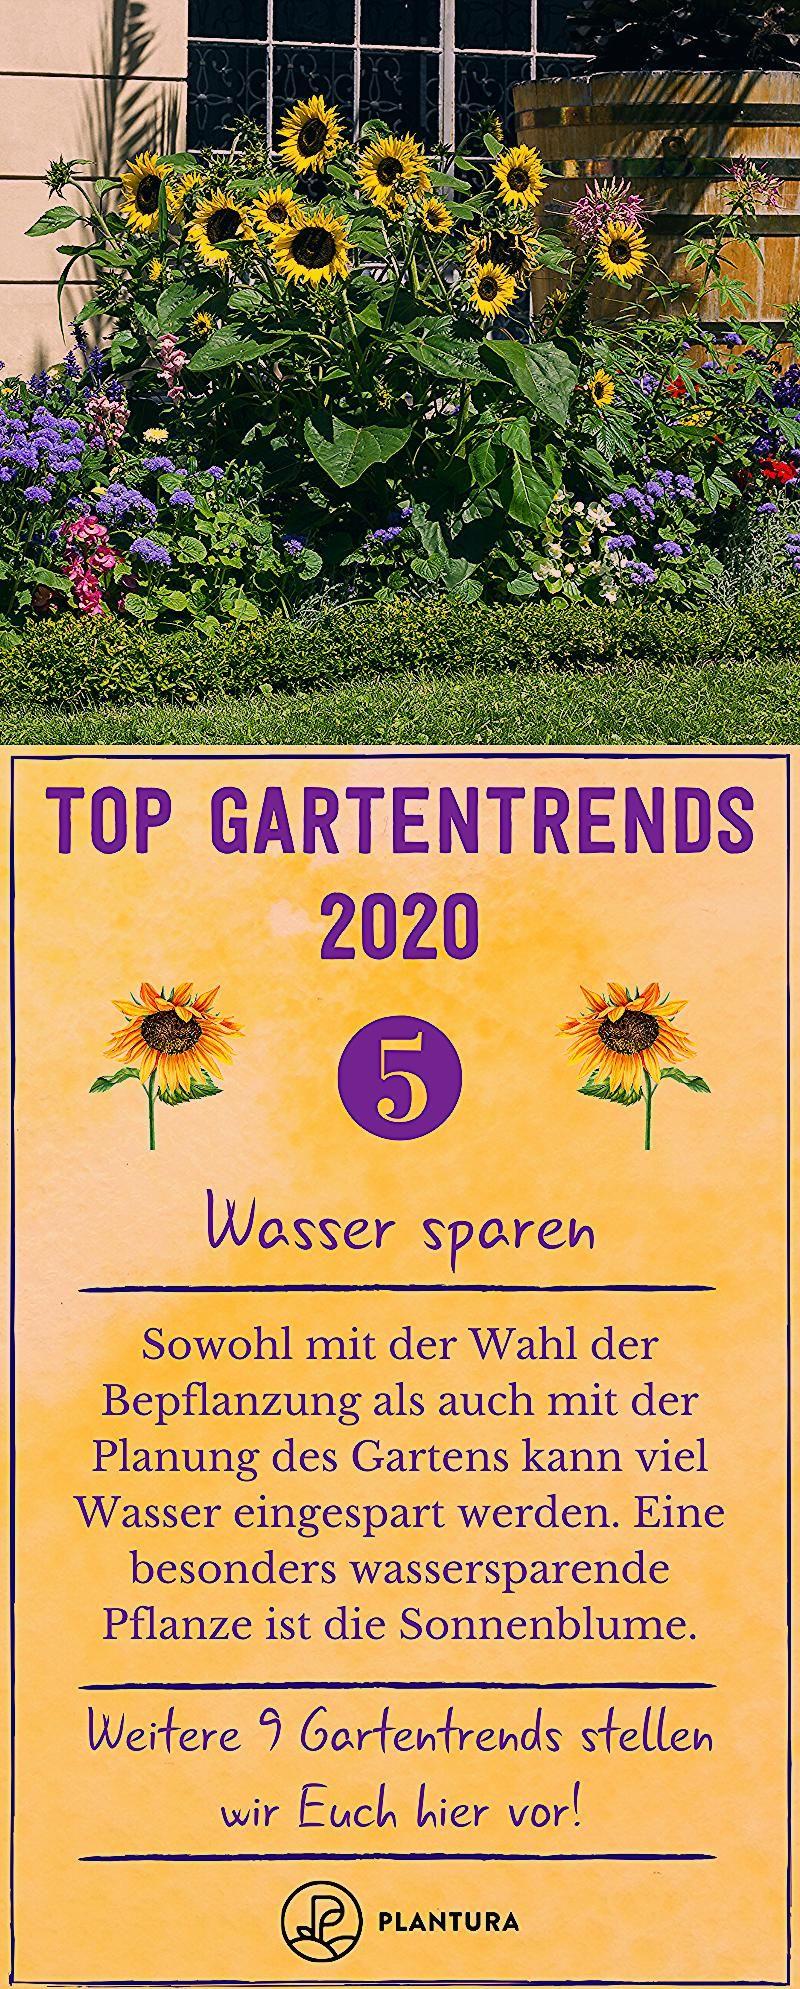 Top 10 Gartentrends 2020 – Wasser sparen